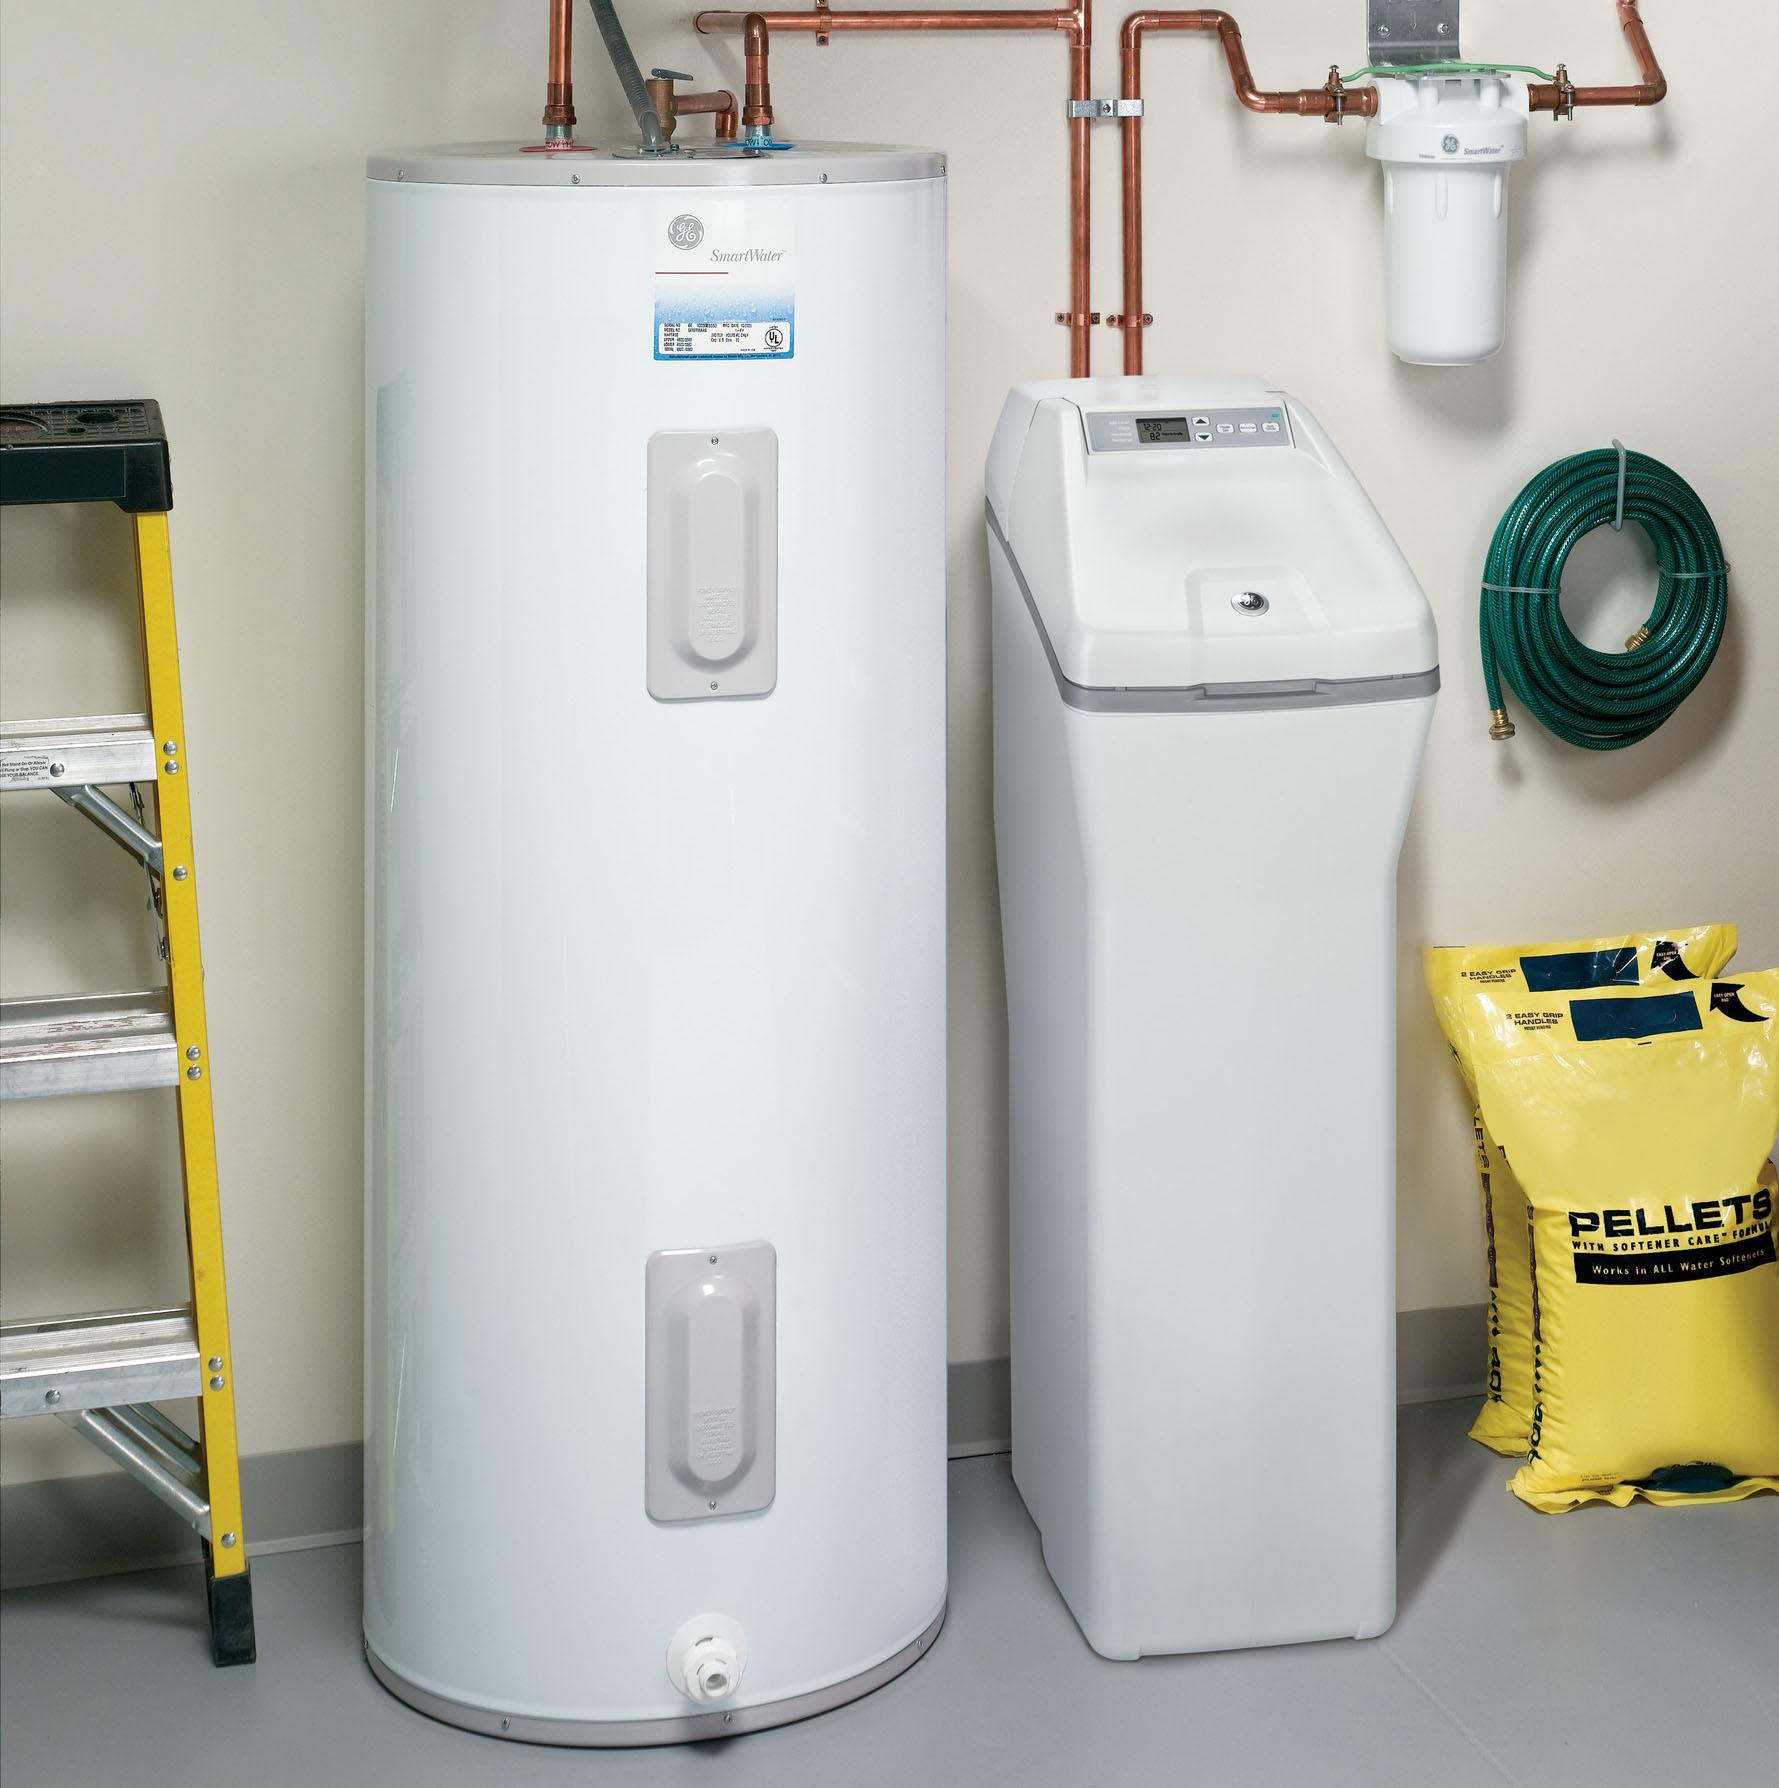 How To Repair A Water Softener Water Softener Archives Als Plumbing Llc